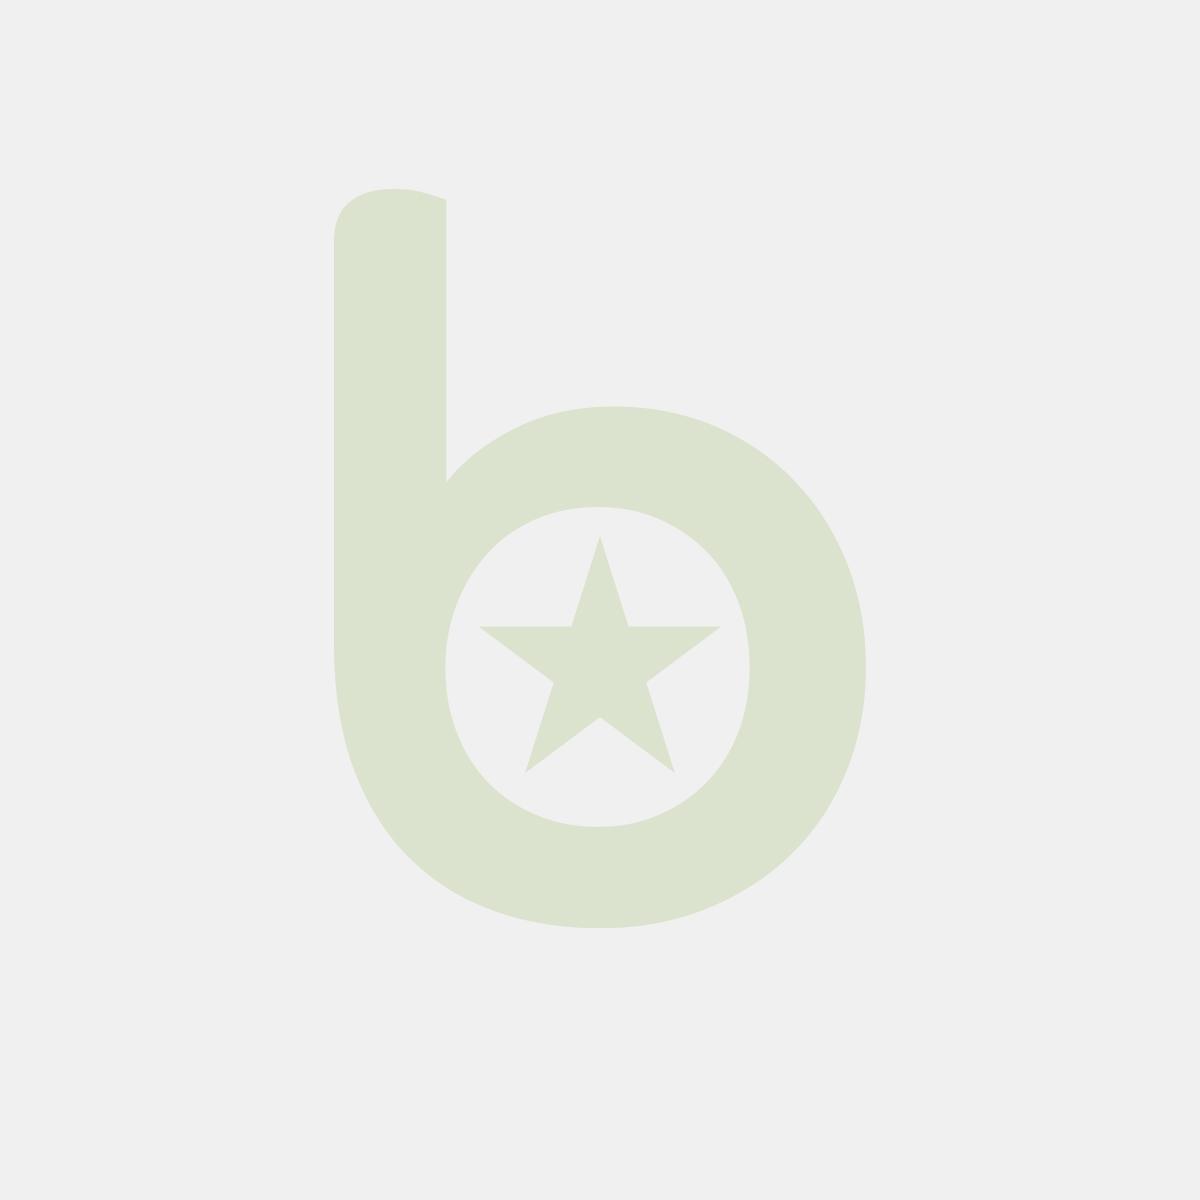 Kapelusz - melonik z brokatem czarny, cena za 1 sztukę